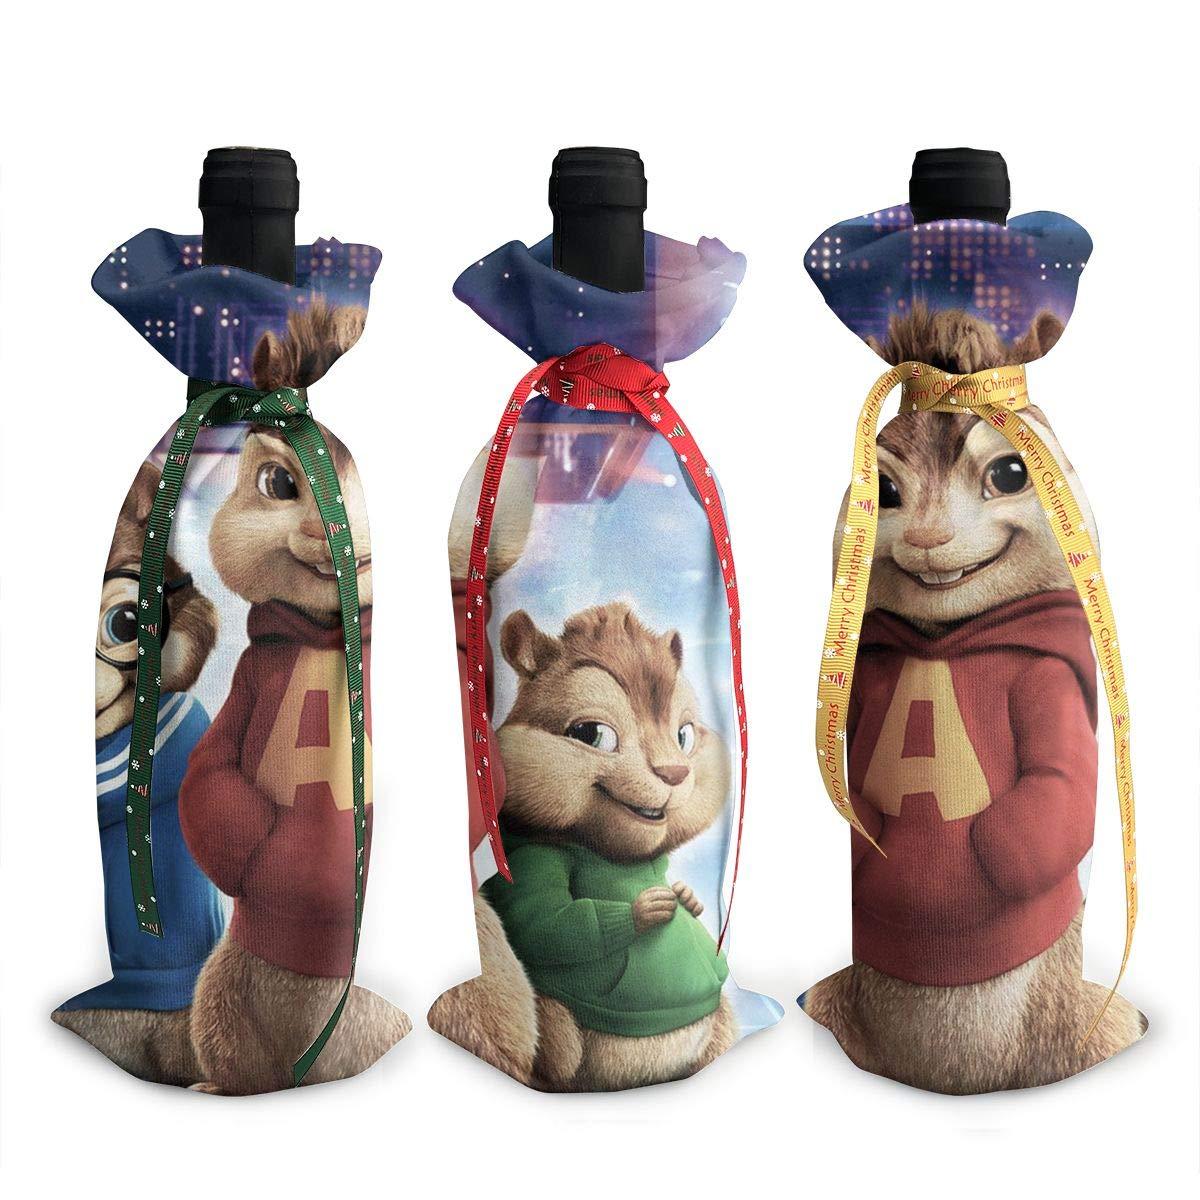 Alvin and The Chipmunks ワイントートキャリアバッグ/財布 旅行/キャンプ/ピクニック用 3個セット B07K4MH28R